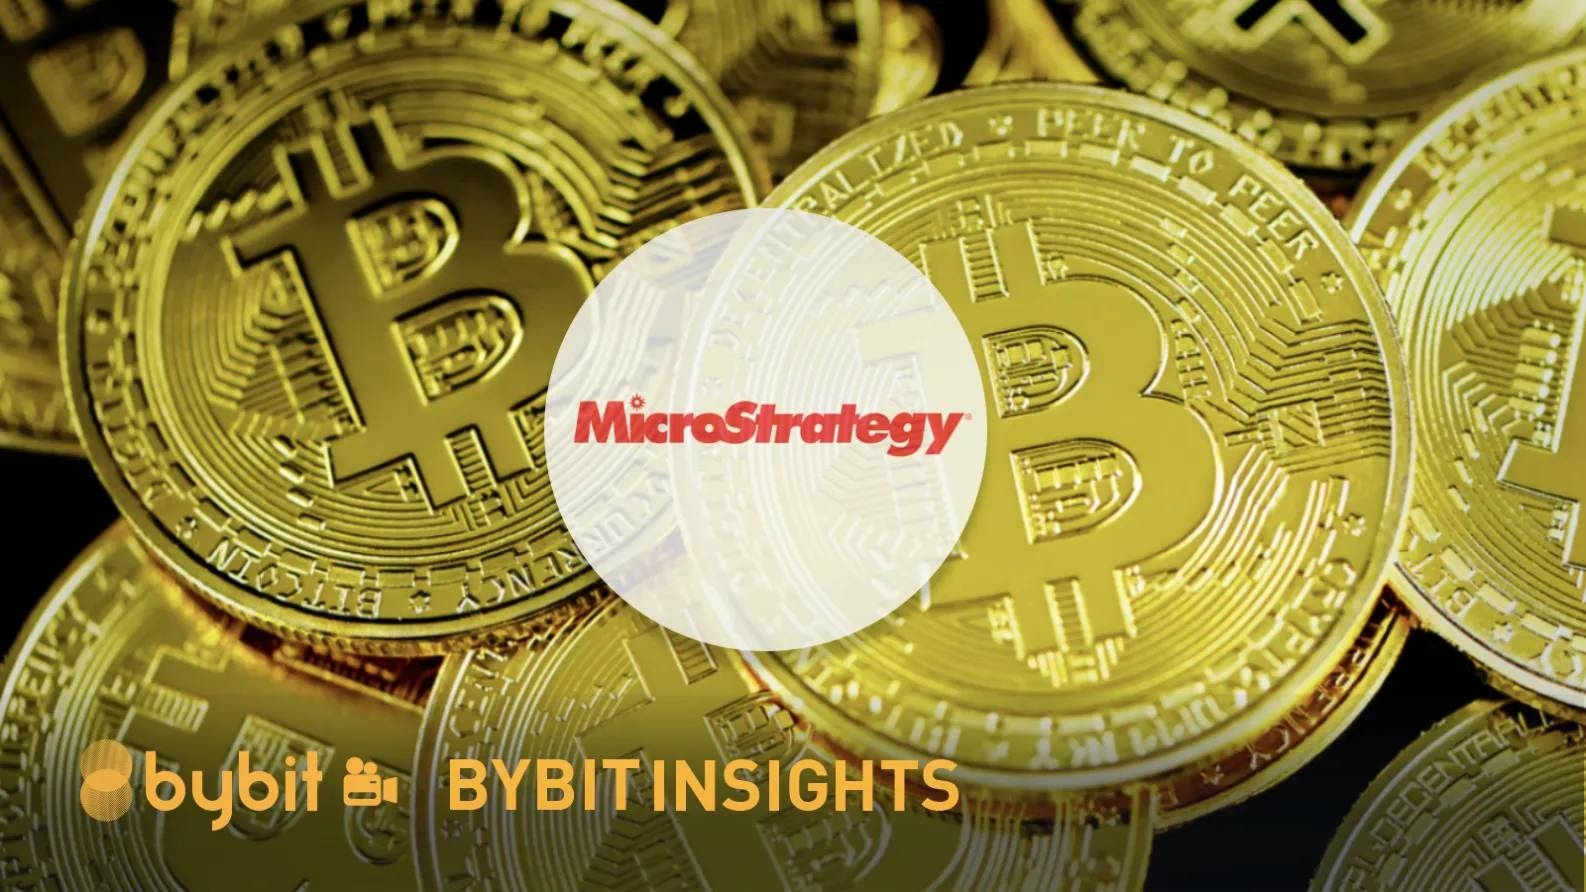 новости компании Microstrategy